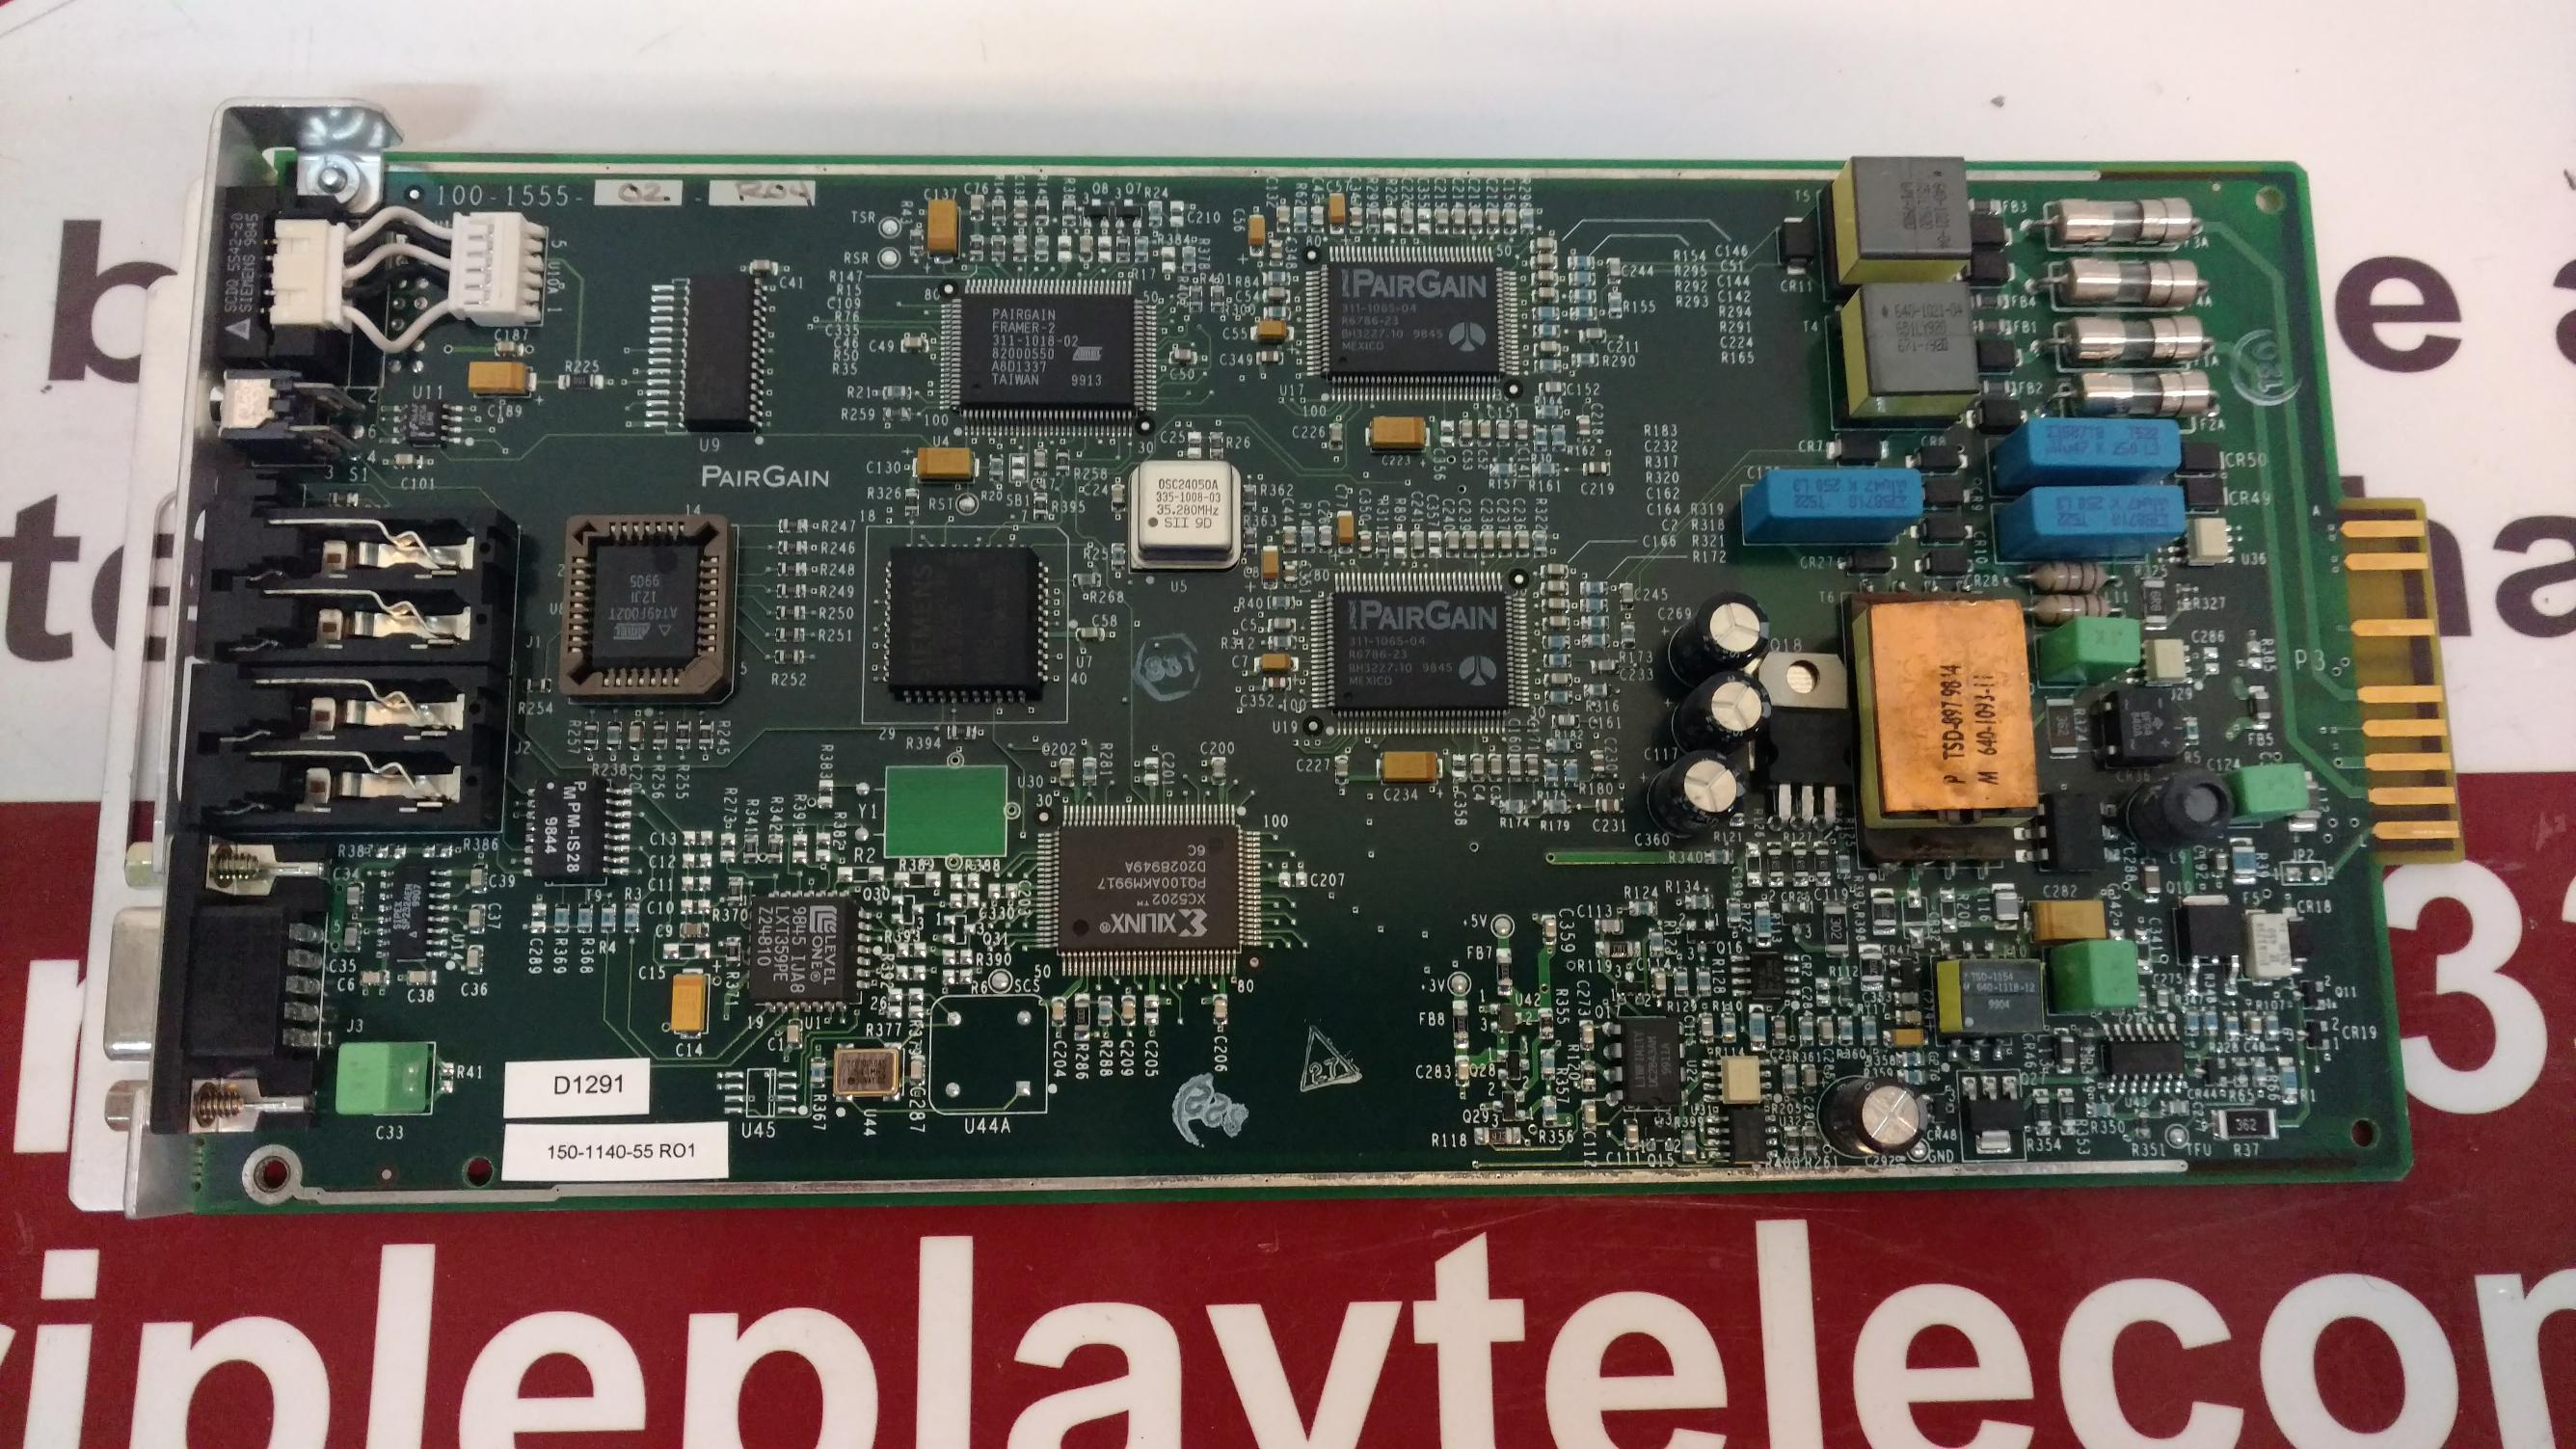 *NEW* 150-1140-05-X07 HLU-319-L5 ADC PAIRGAIN TE CONNECTIVITY Repeater